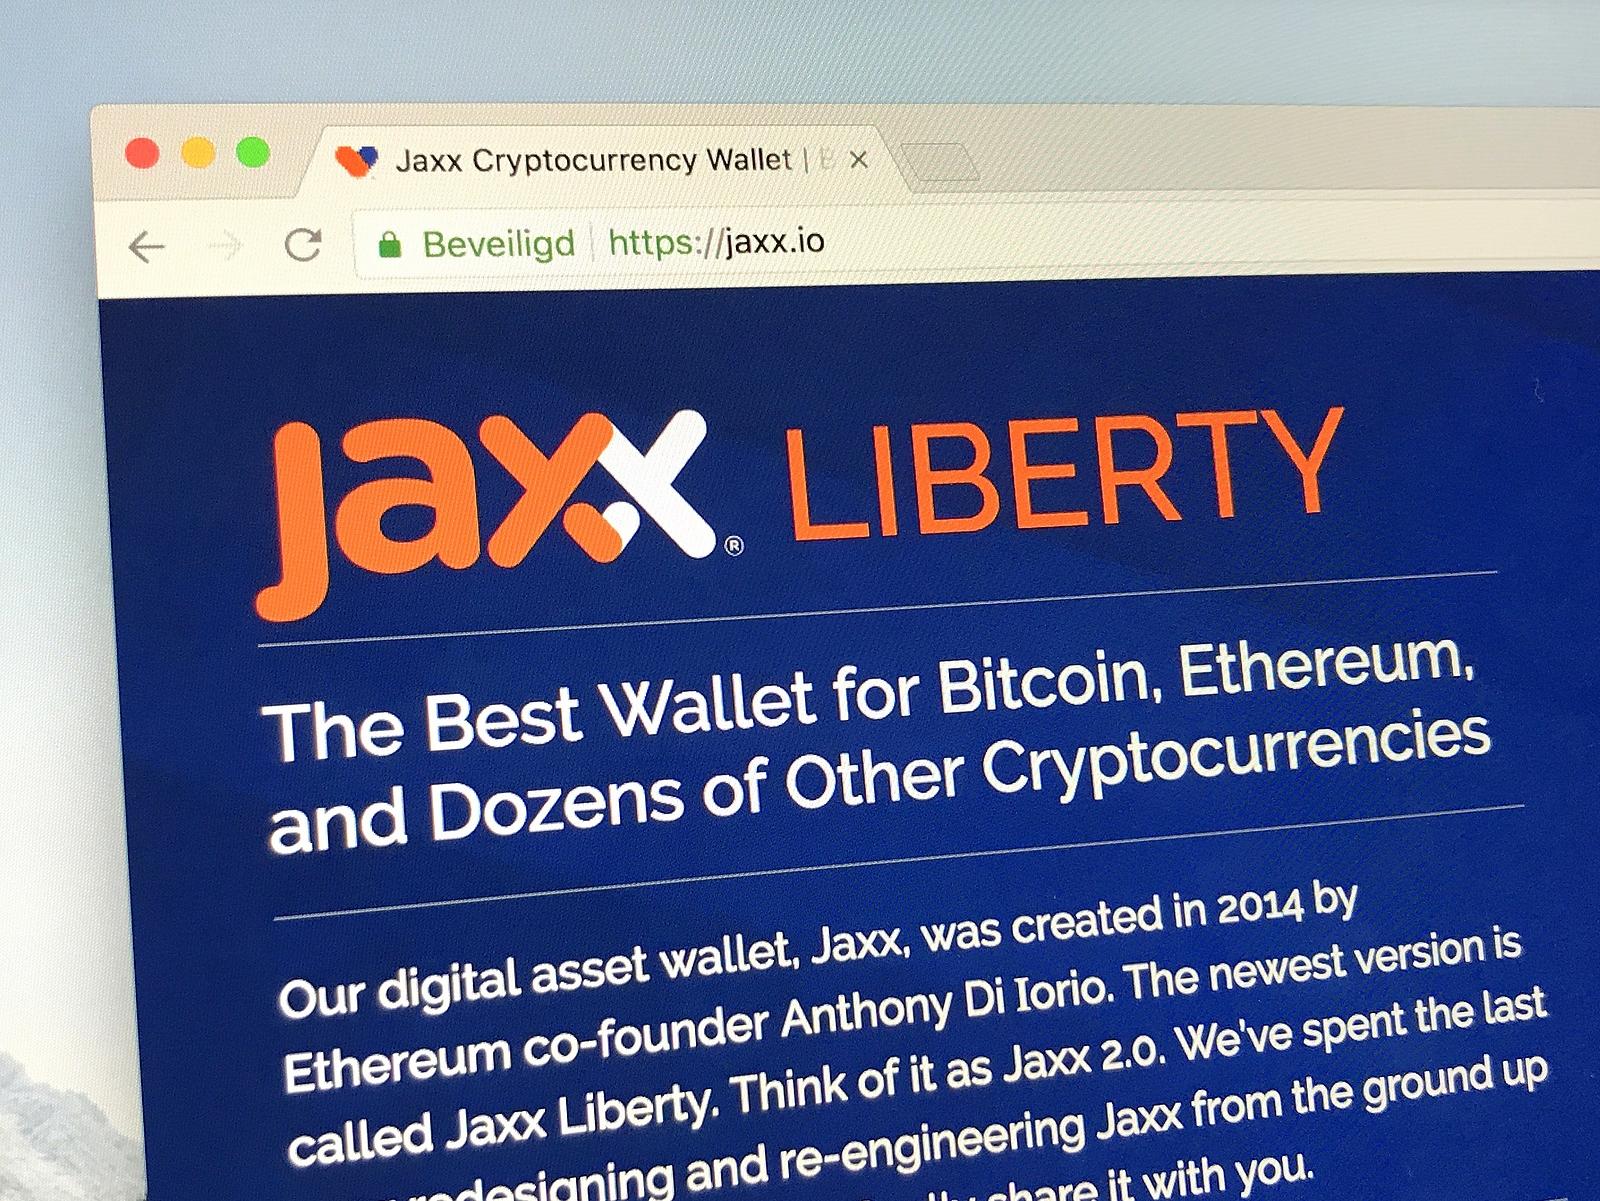 Jaxx wallet recovery